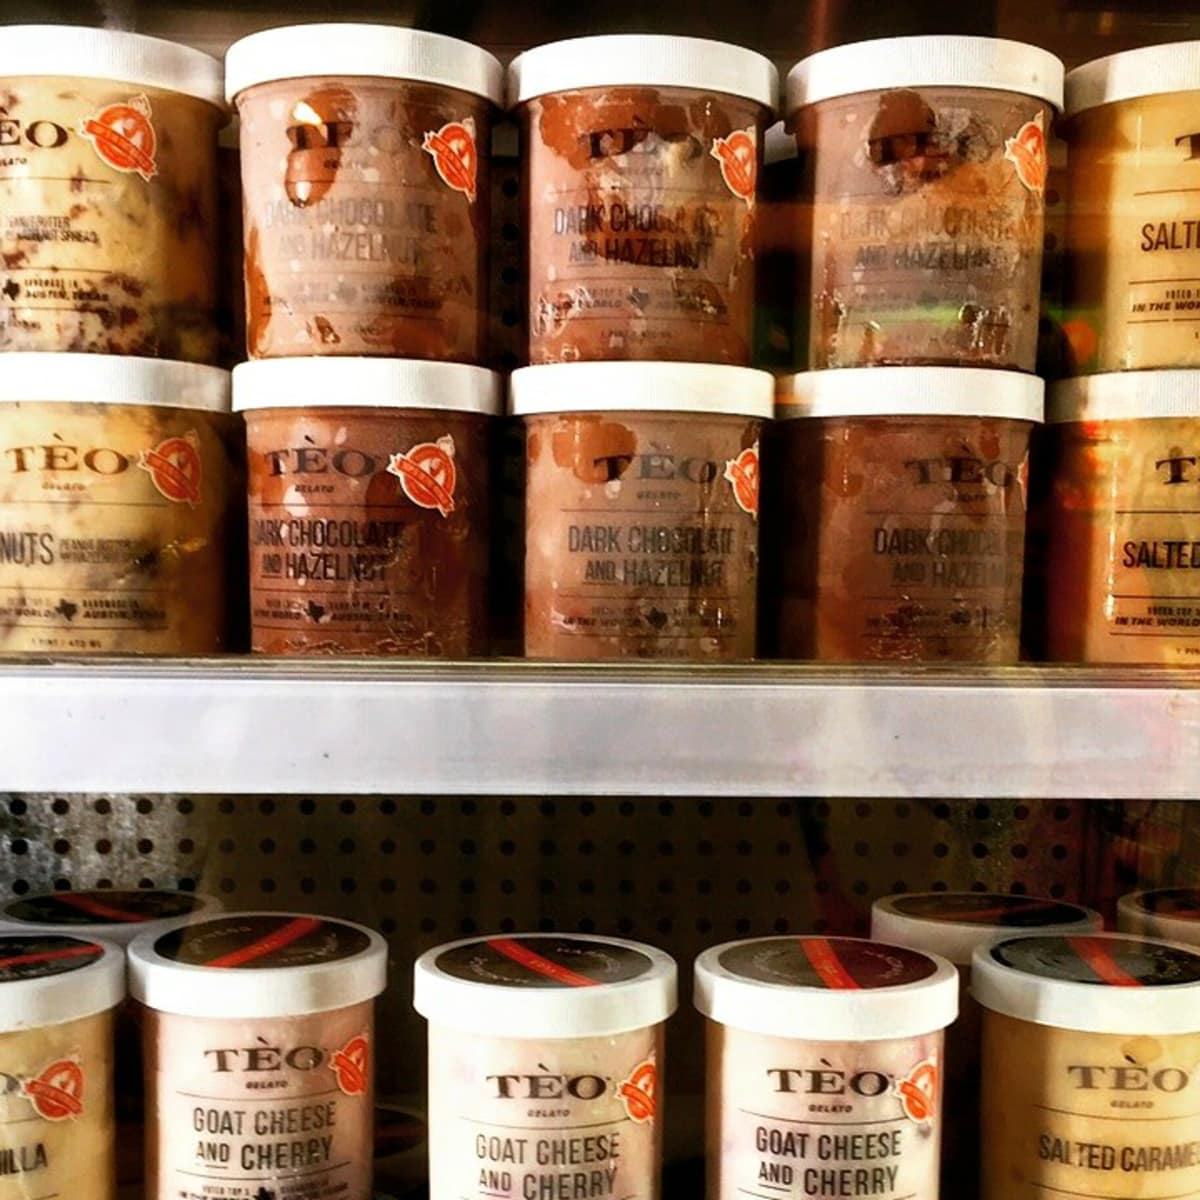 Teo Gelato product shelves brand